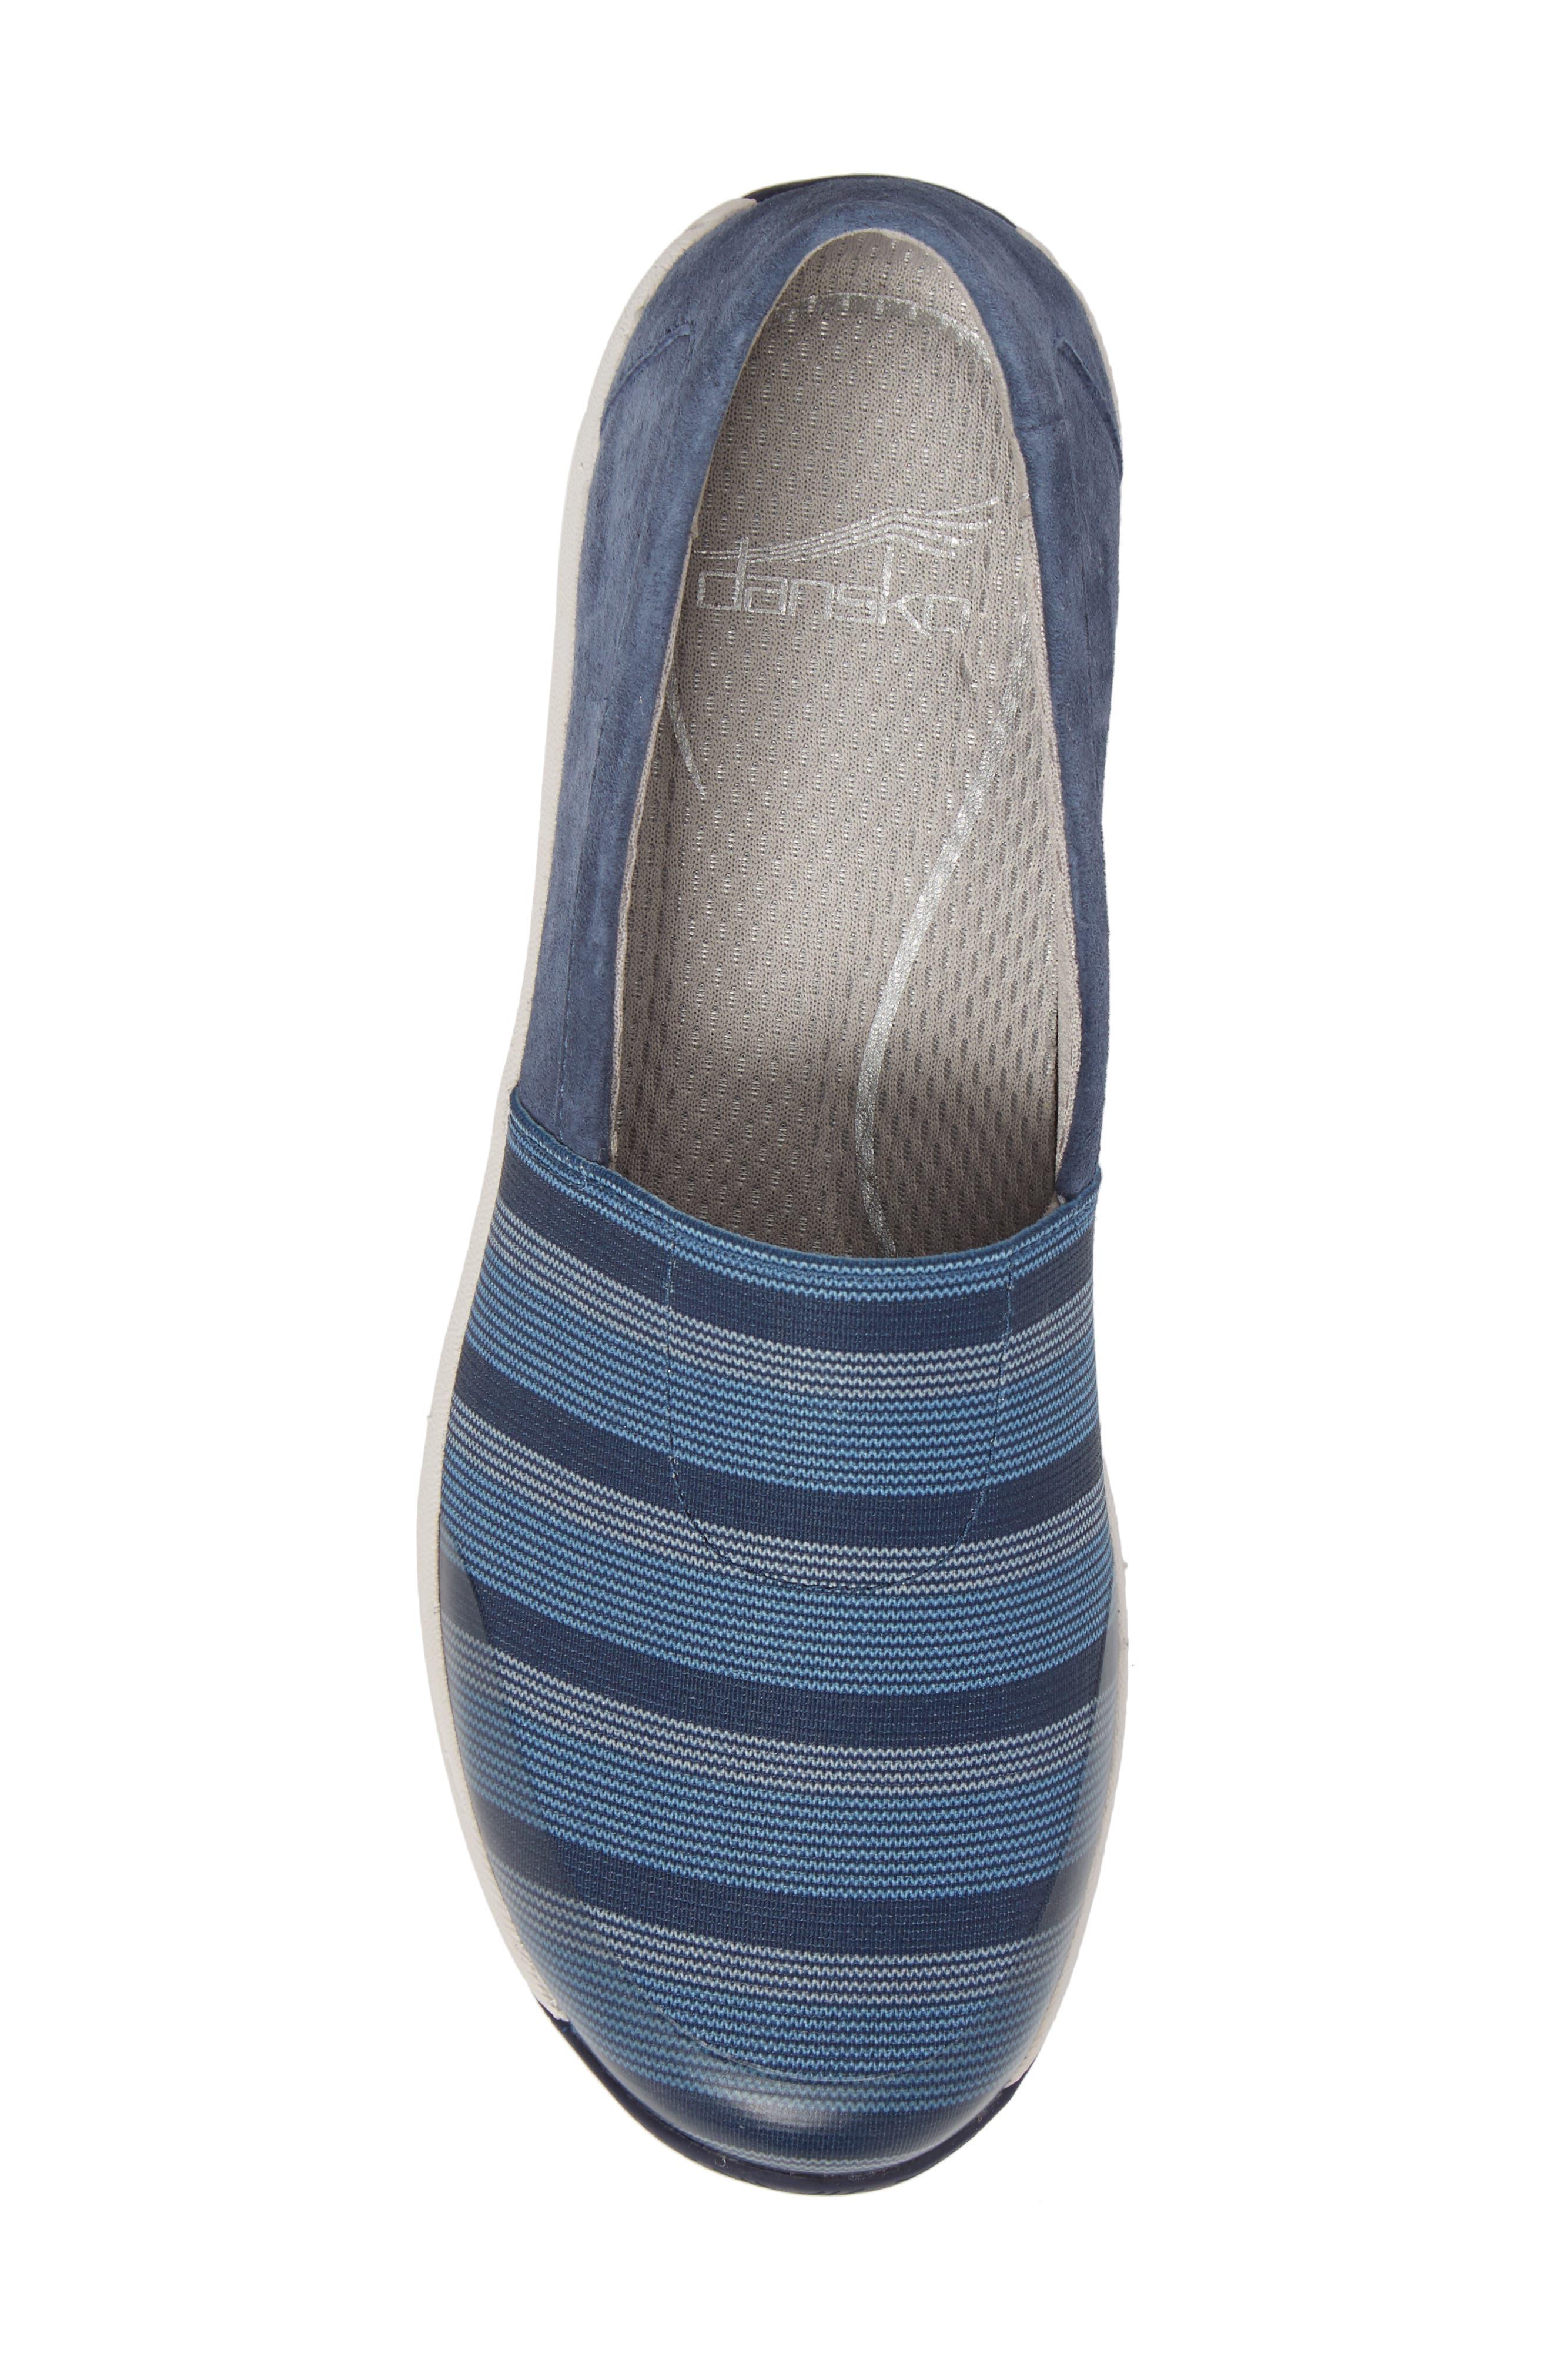 Harriet Slip-On Sneaker,                             Alternate thumbnail 5, color,                             Blue Suede